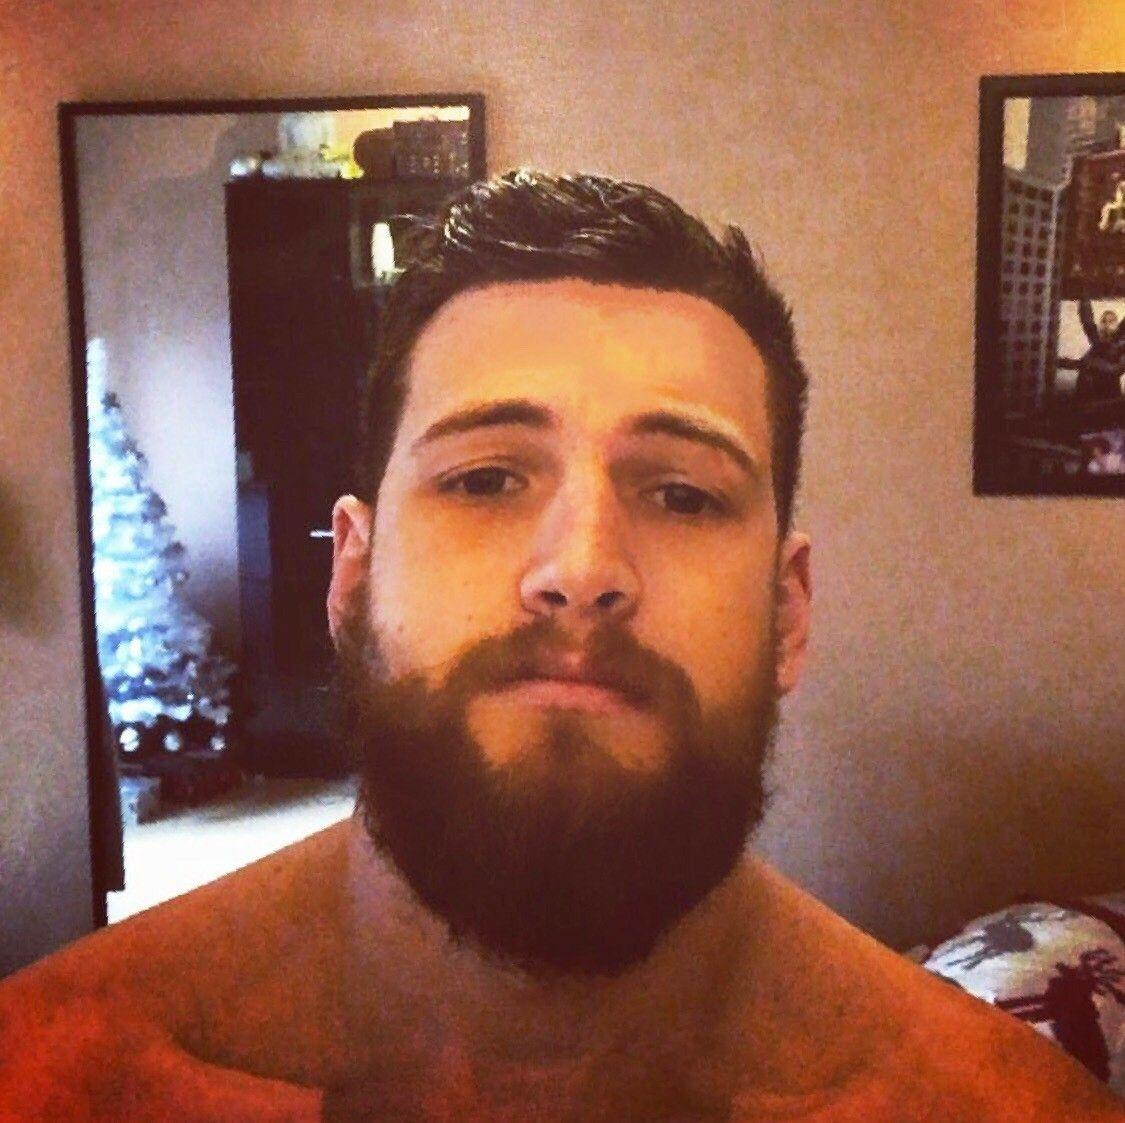 Hot mens haircuts pin by kevyn sánchez on look barbas beard u hair  pinterest